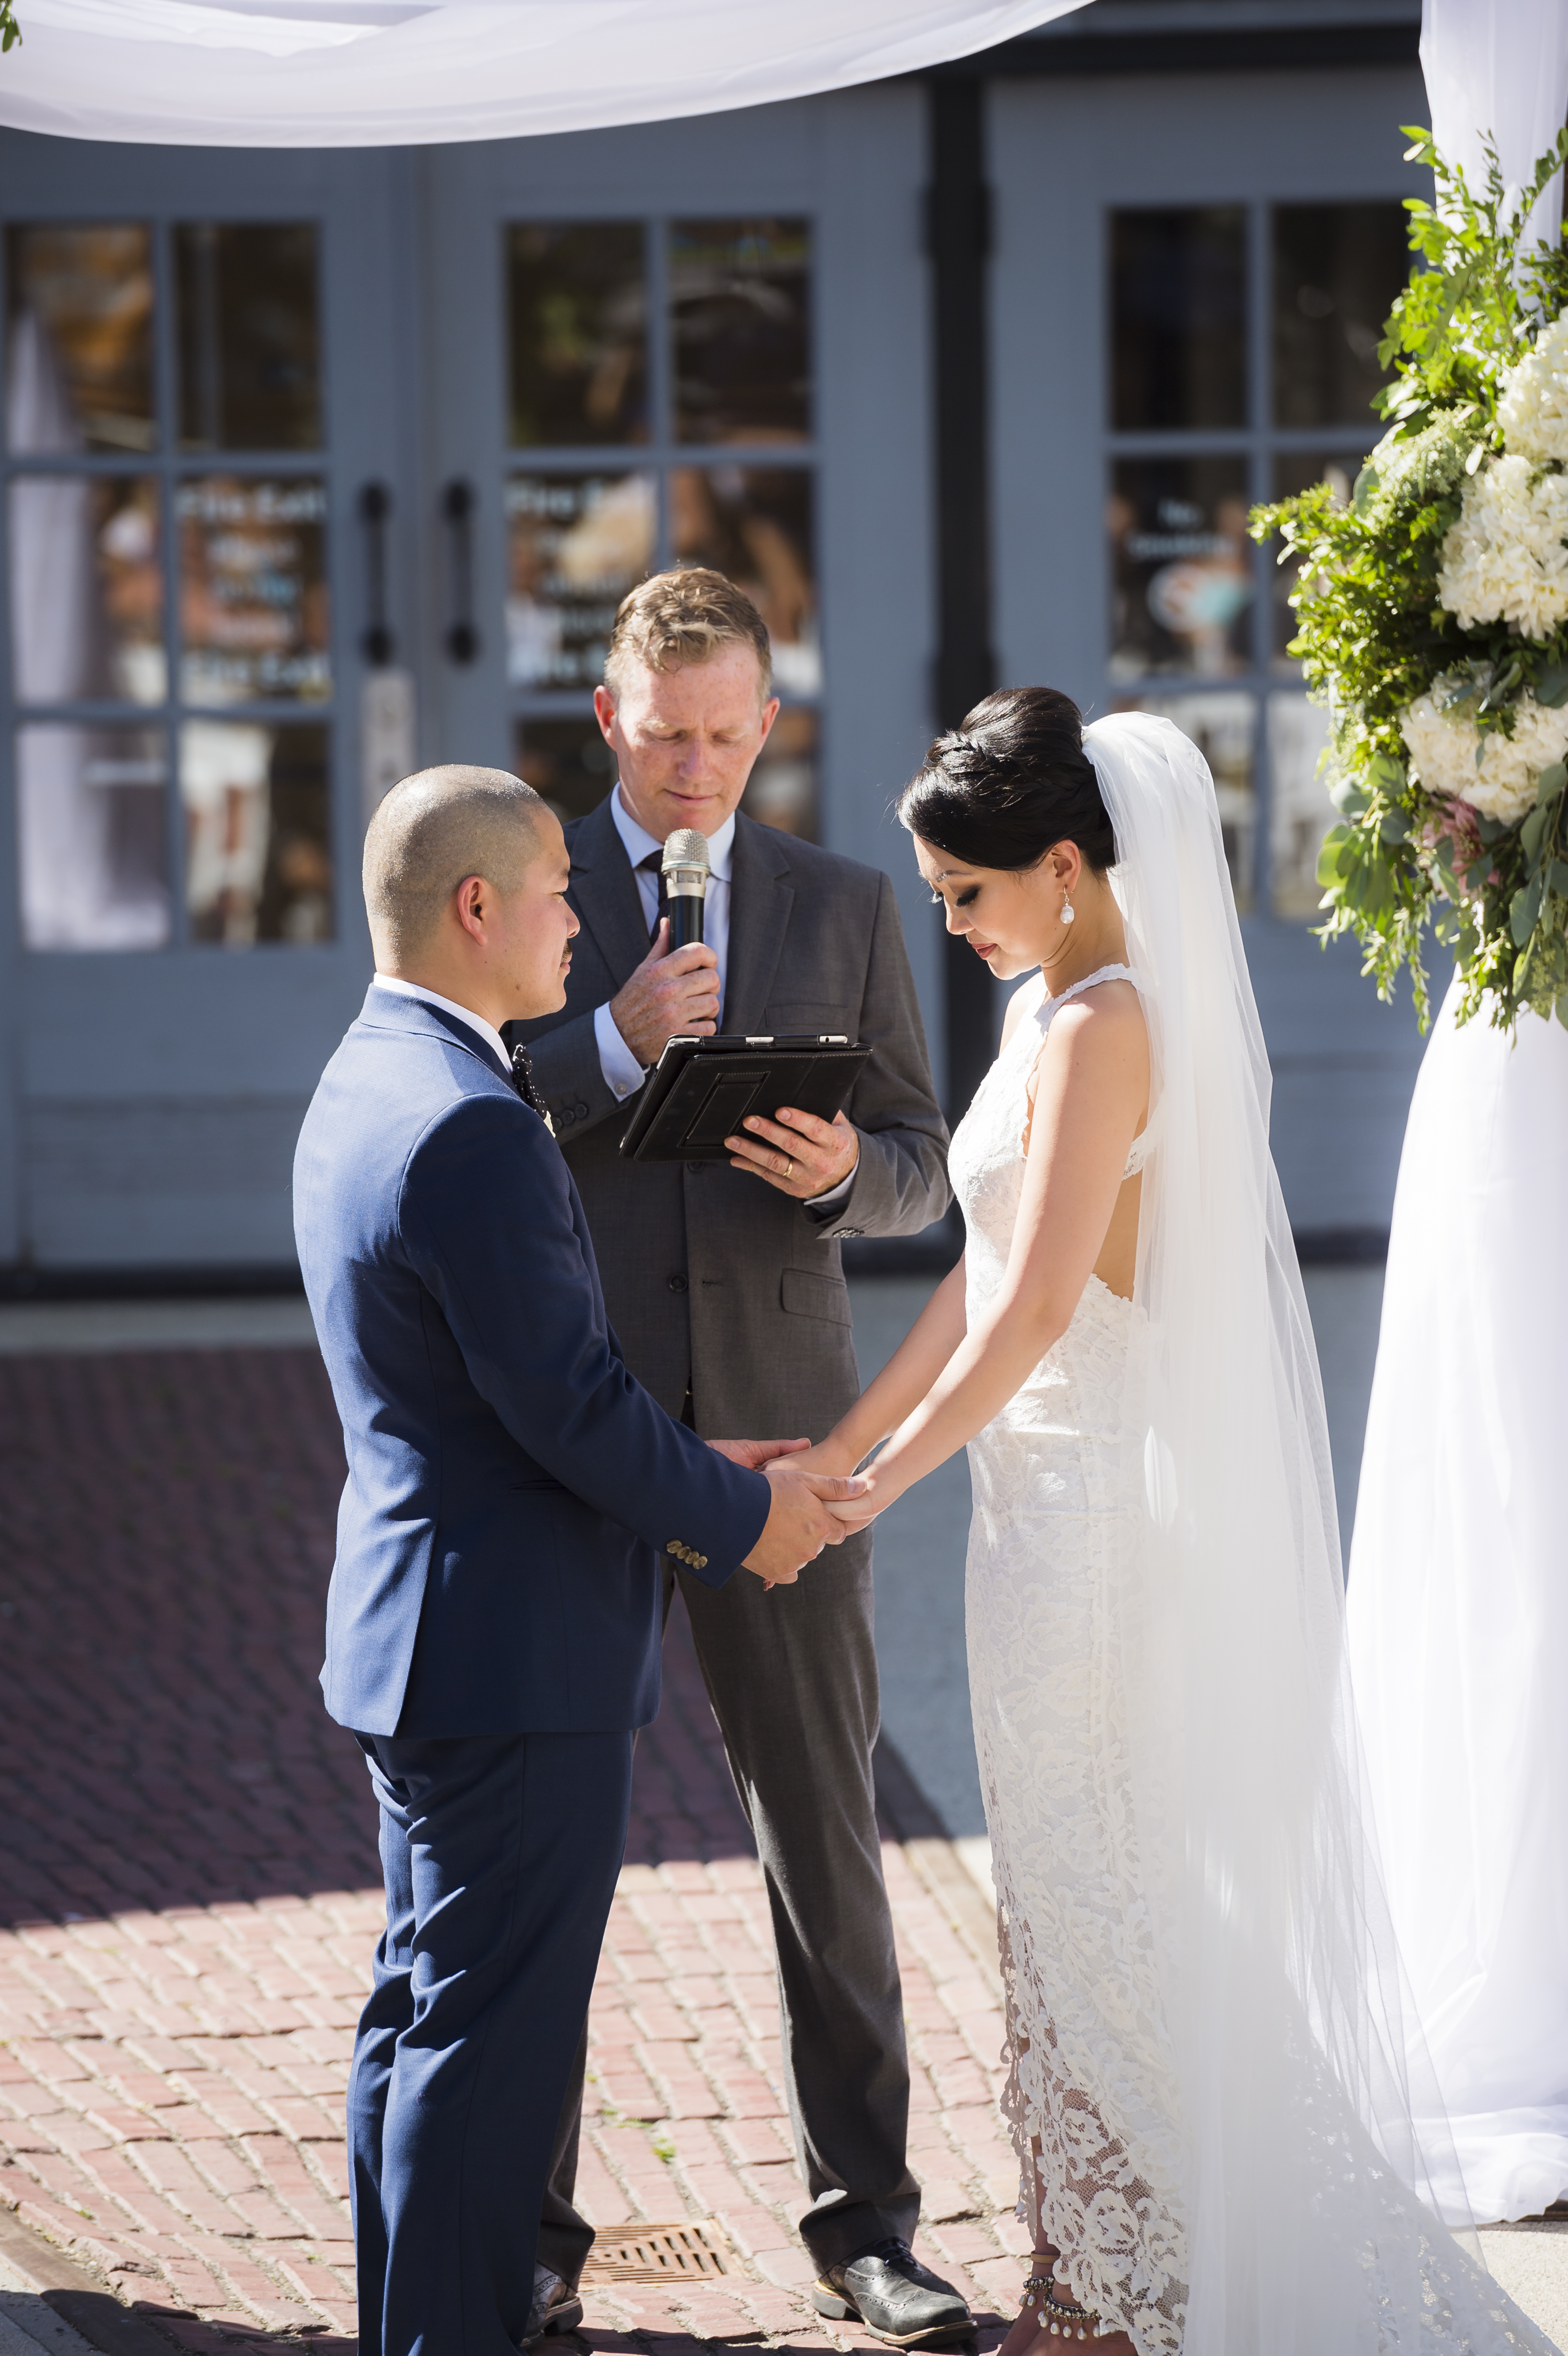 Megan cushing wedding